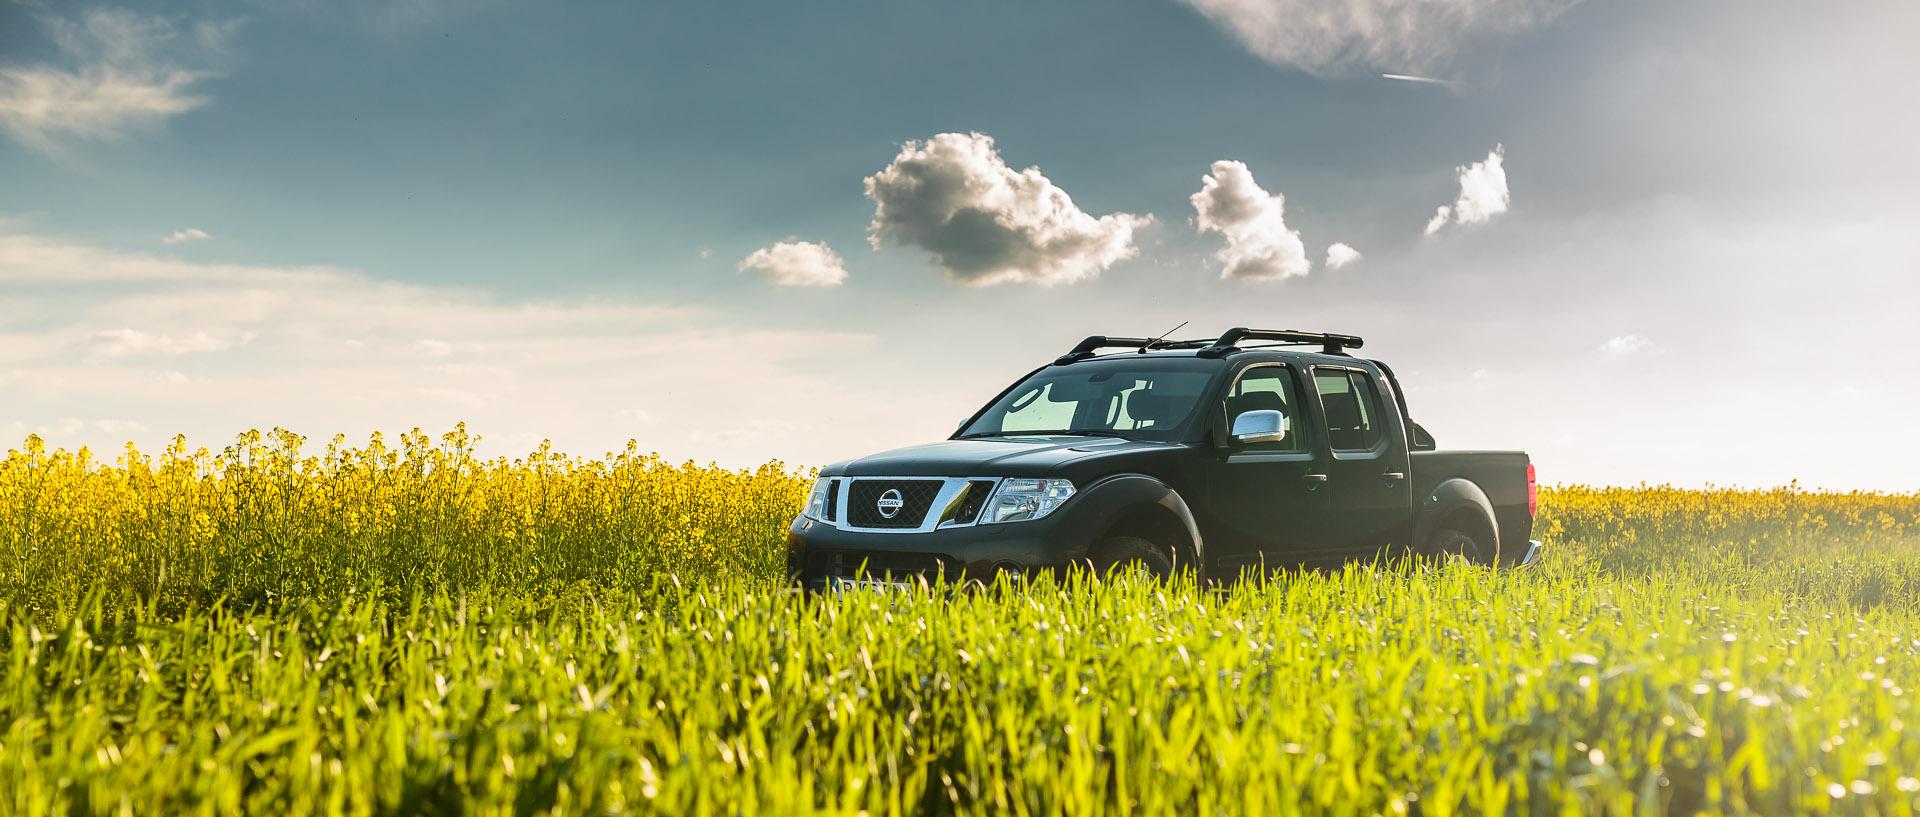 Drive Test Nissan Navara – 2.5 dCi Double Cab